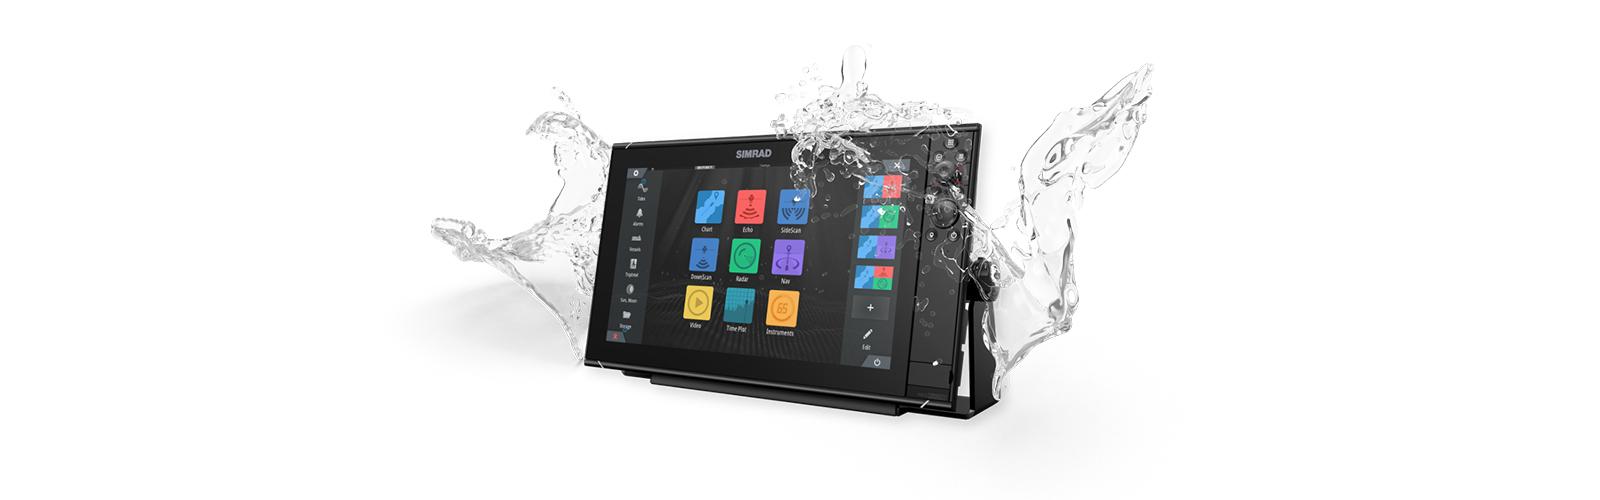 nss-unit-water1.jpg